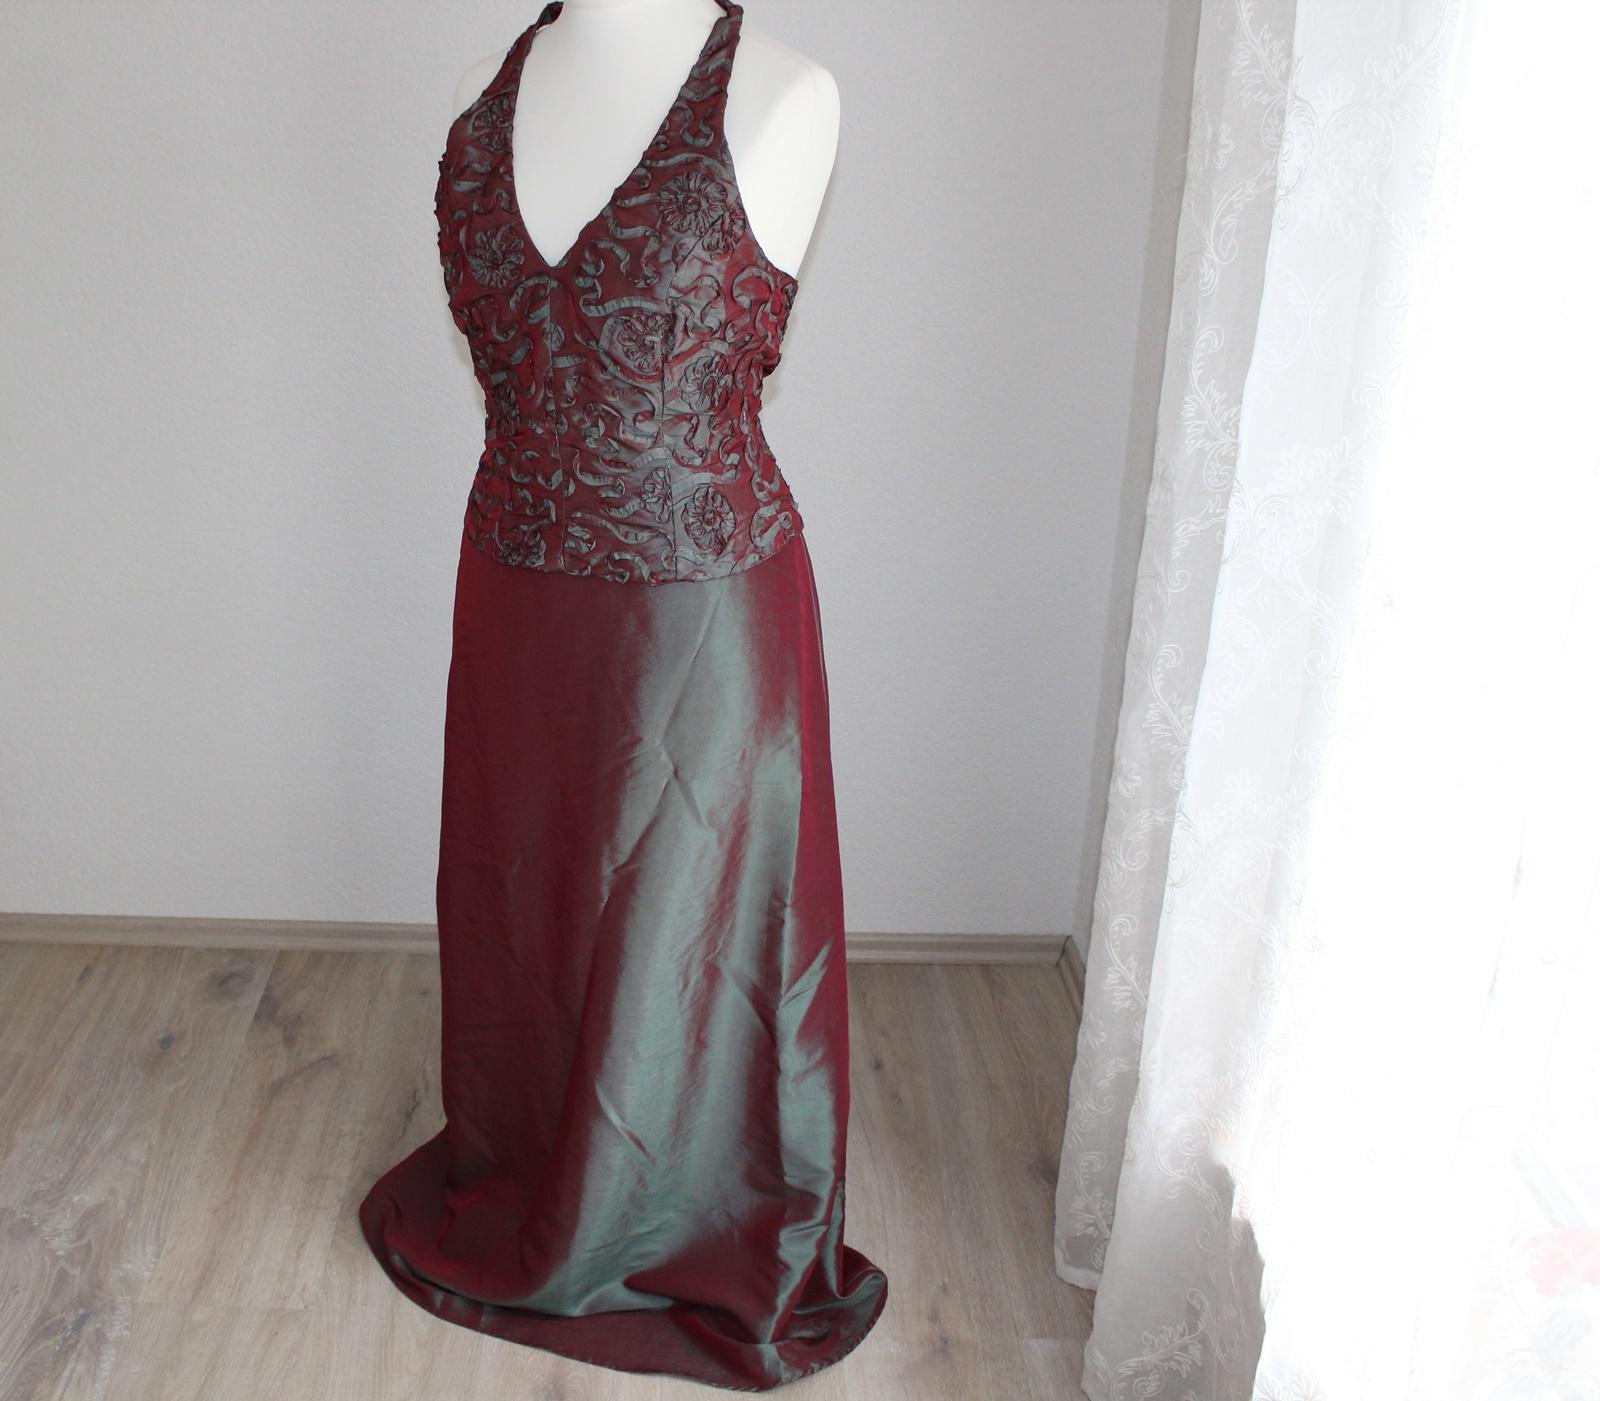 16 teiliges langes Kleid Gr 16 Abendkleid Kostüm Karneval